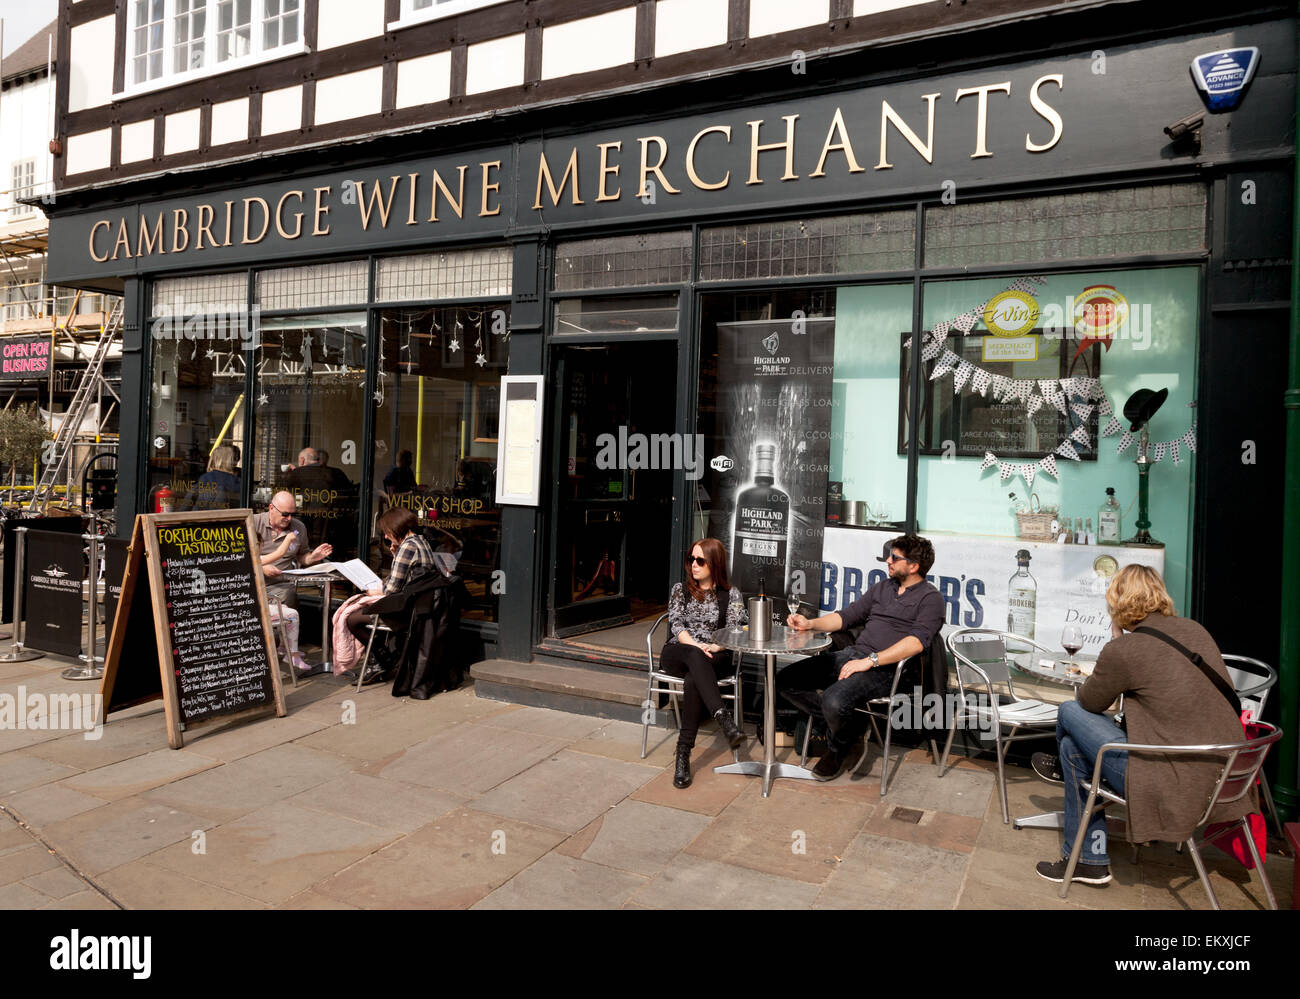 People sitting drinking outside Cambridge Wine Merchants on a sunny day, Cambridge England UK - Stock Image